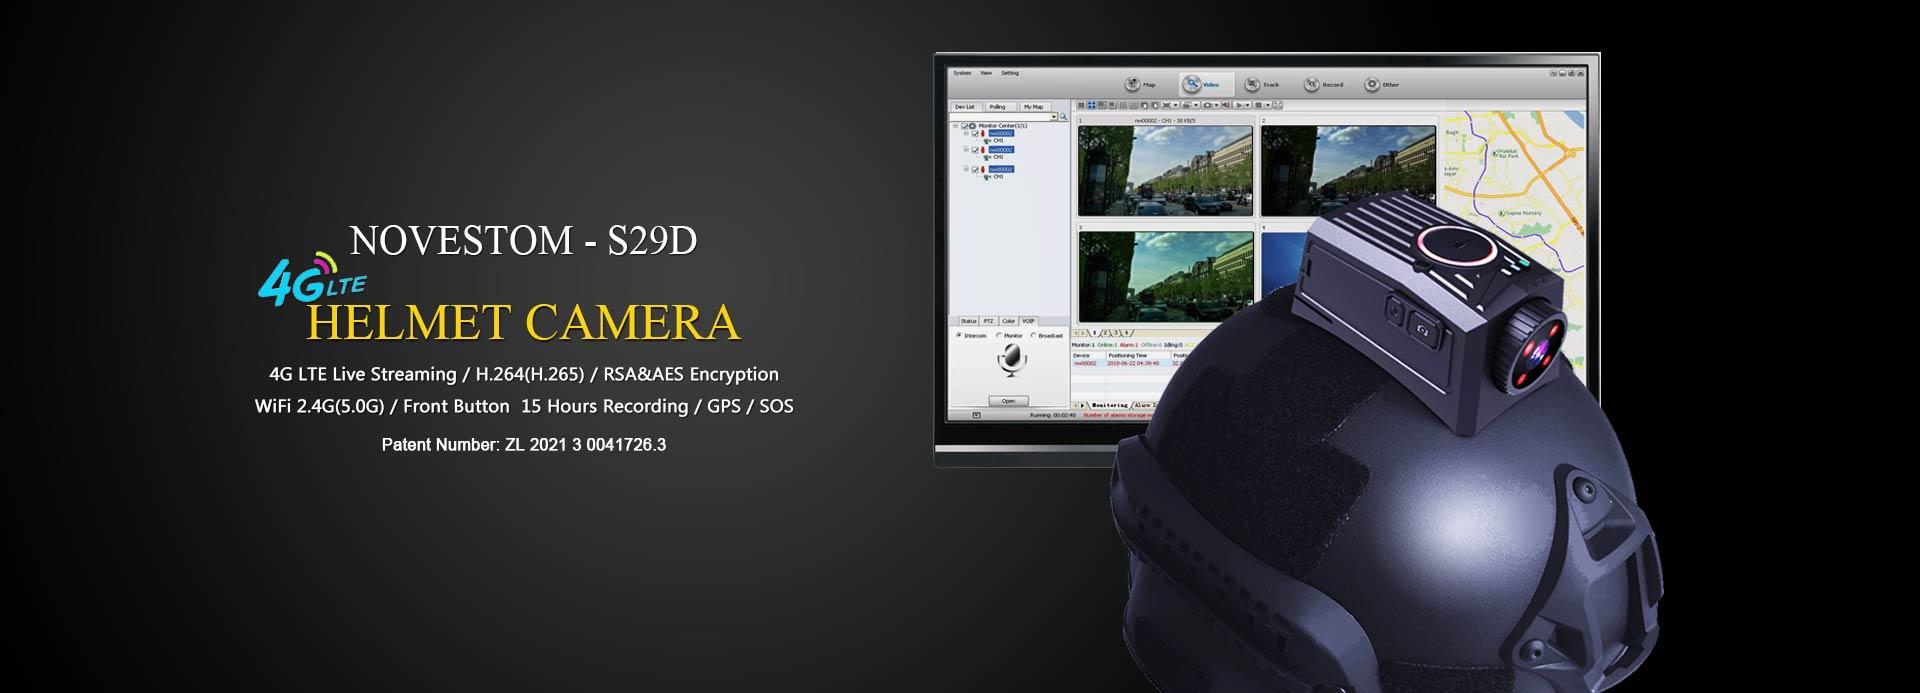 NOVESTOM S29D-4G-live-streaming-helmet-camera with GPS WIFI LTE live